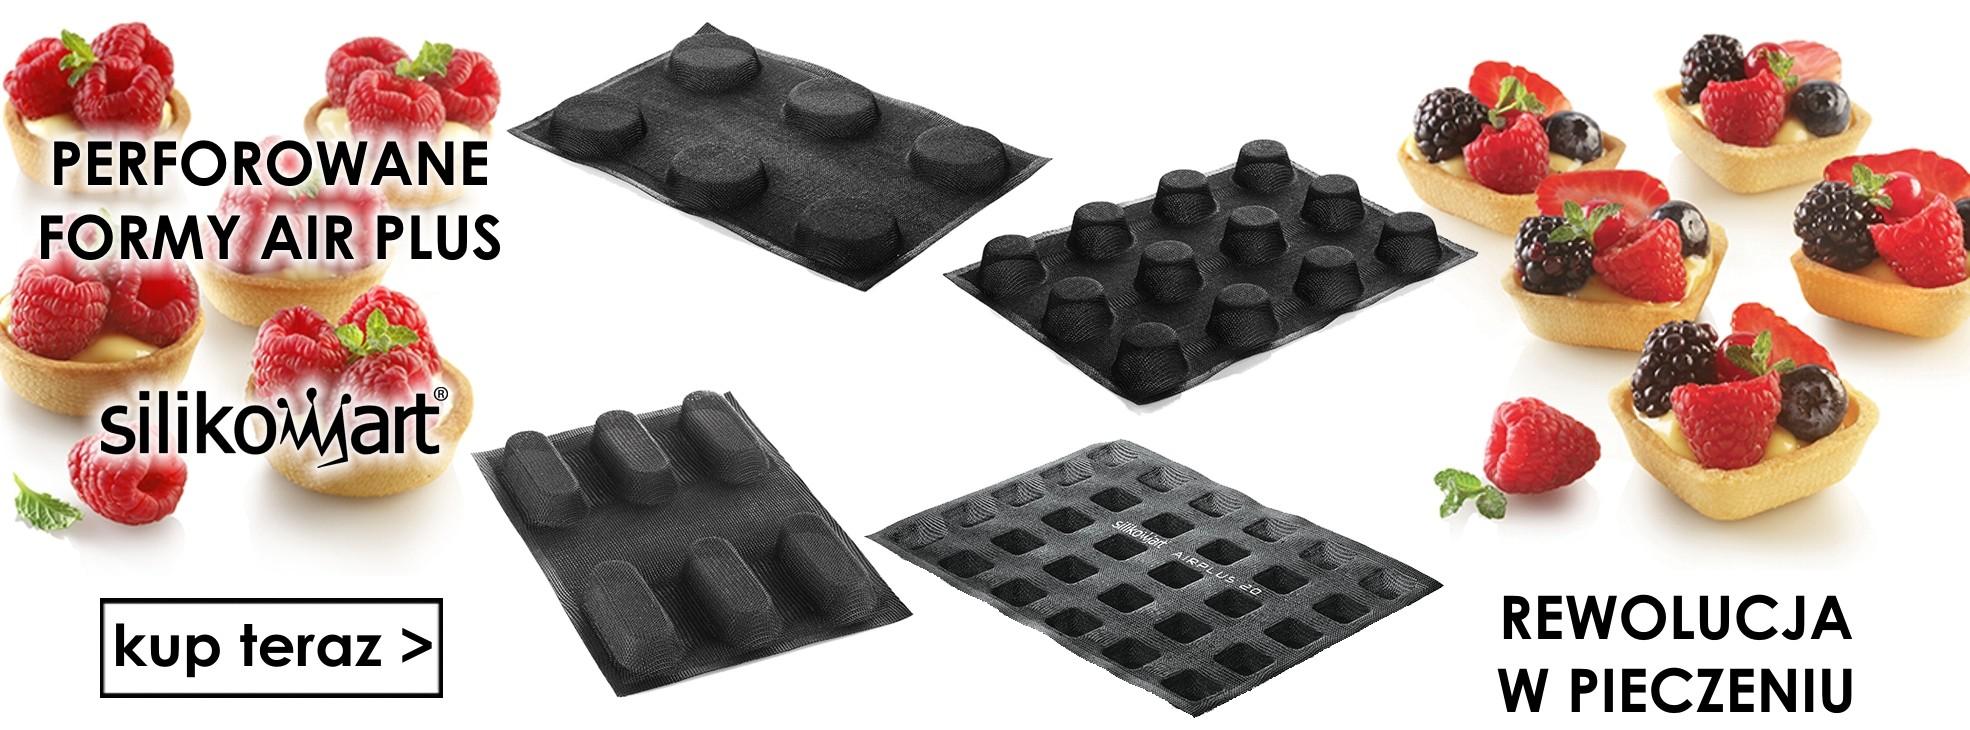 Nowe perforowane formy silikonowe AIR PLUS SILIKOMART